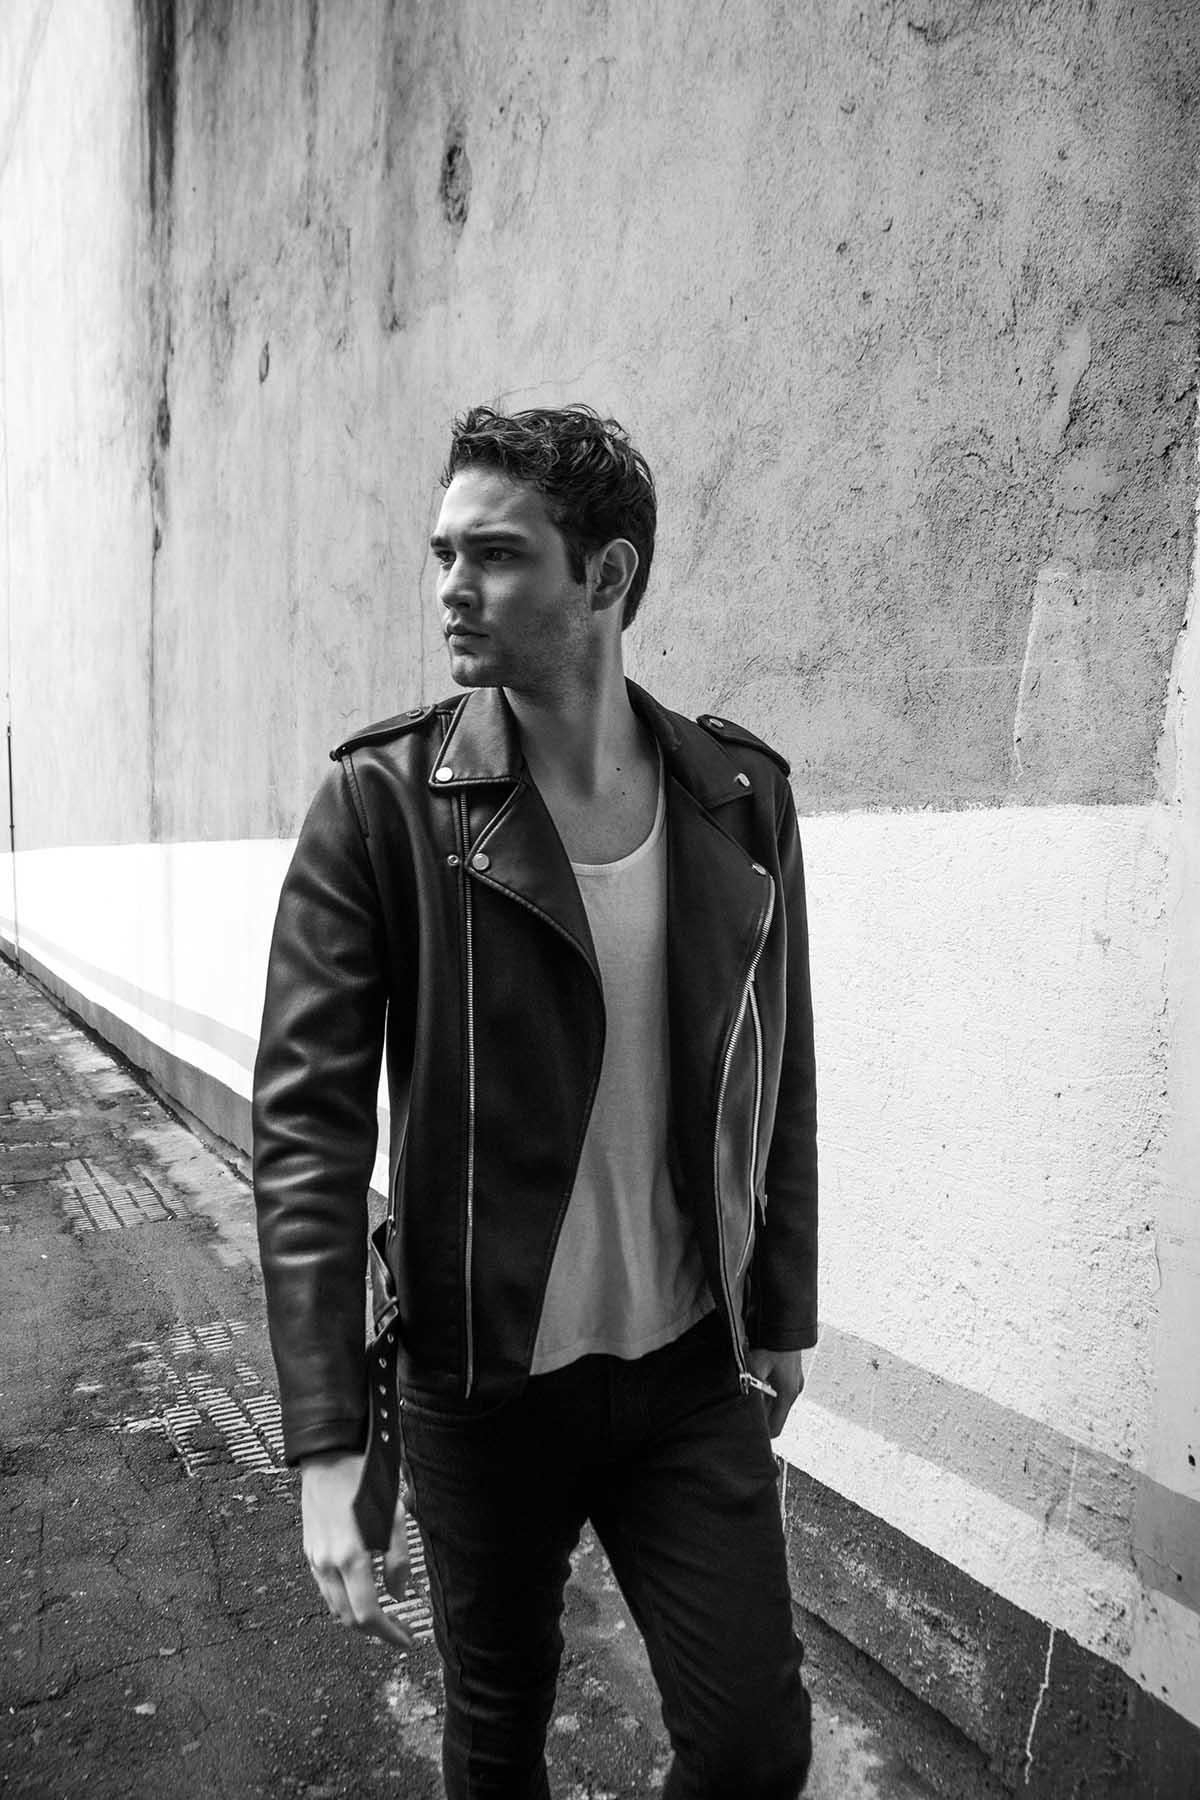 Pedro Arrais by Nanda Tavares for Brazilian Male Model